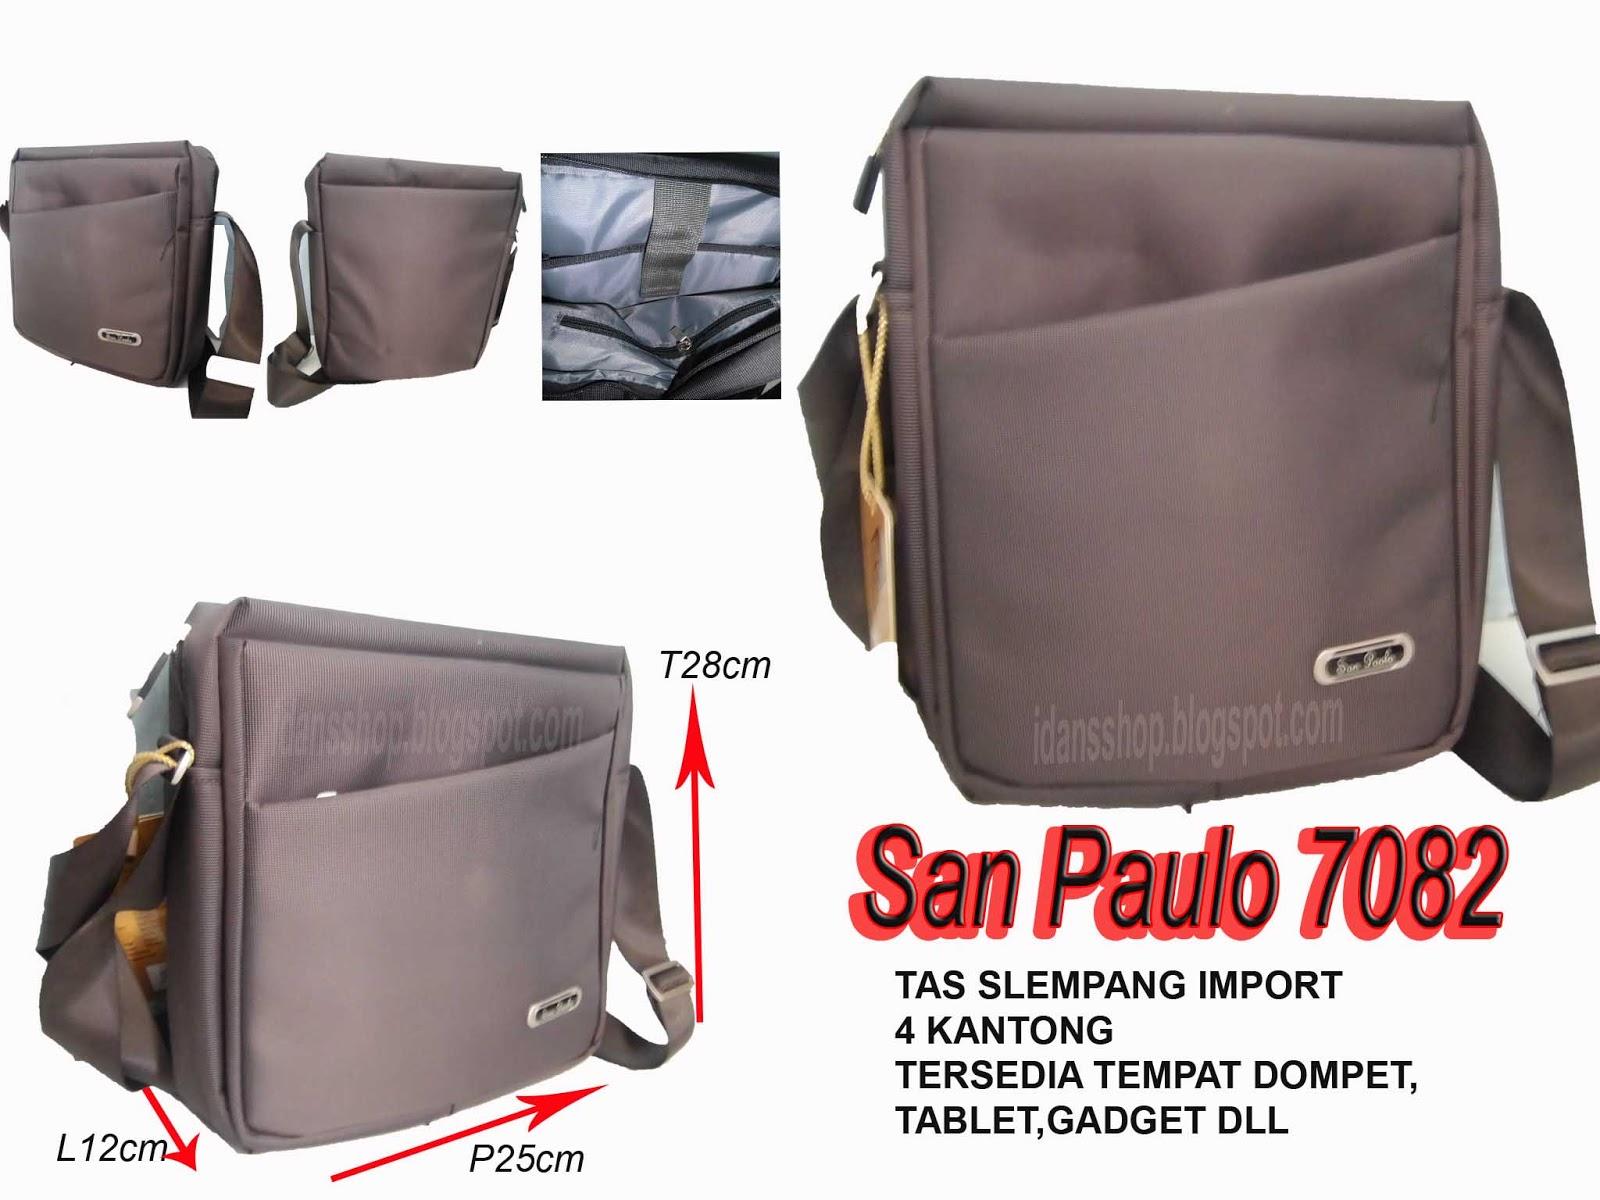 Distributor Tas Rangsel Slempang San Paulo 7082 Import 4 Kantong Tersedia Tempatm Dompettabletgadget Dll Ukuran Panjang 25cm X Lebar 12cm Tinggi 28cm